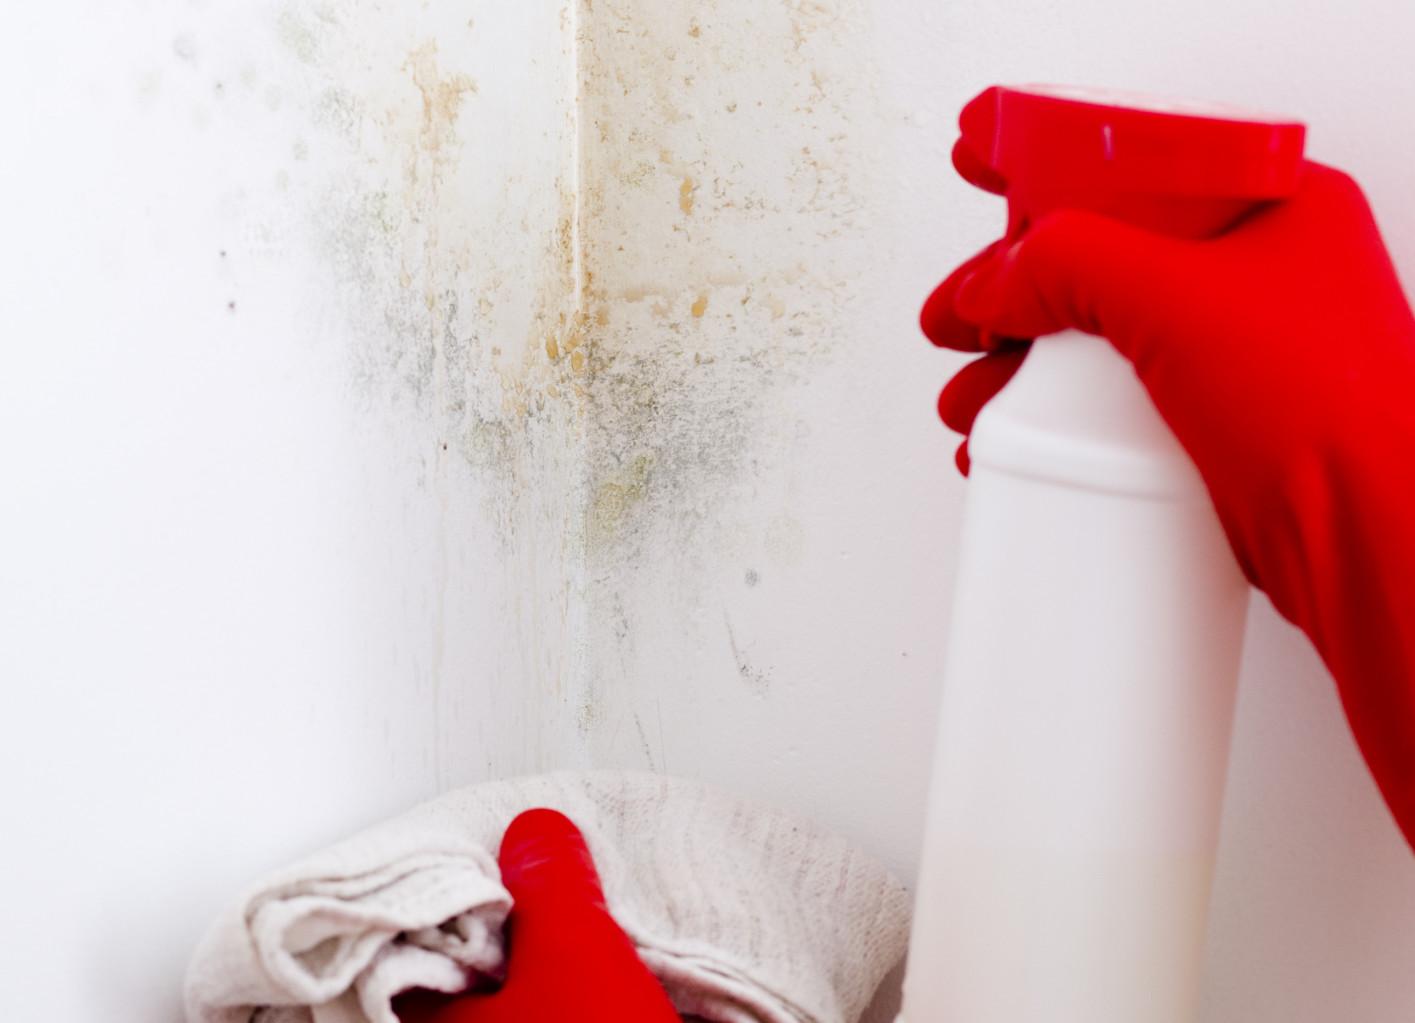 Bersihkan dulu agar terjamin bebas debu